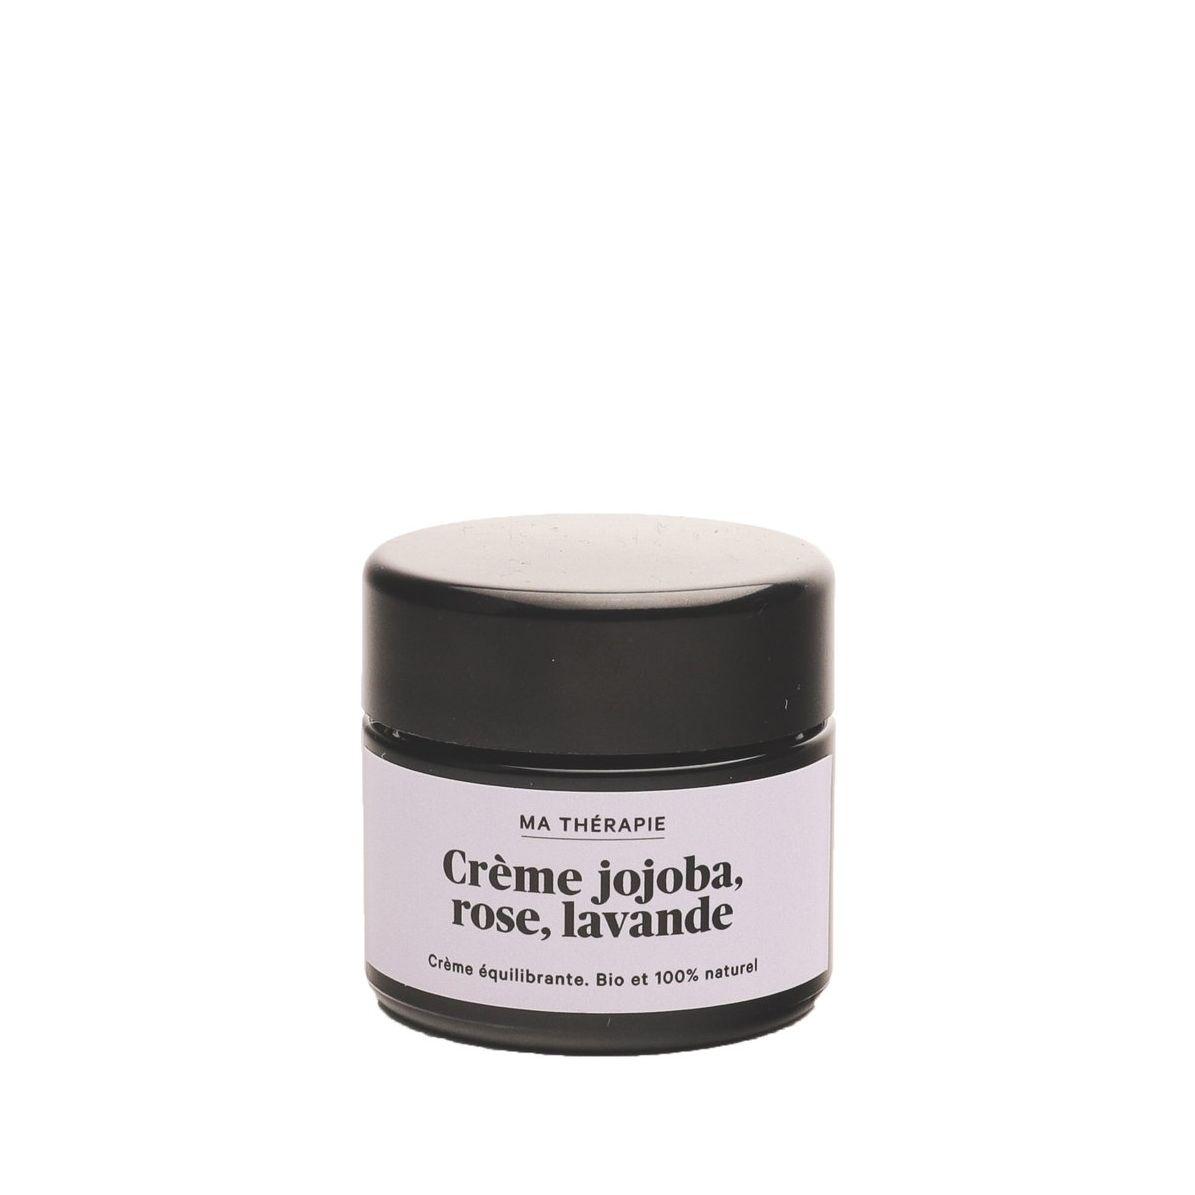 MA THÉRAPIE - Crème Jojoba, Rose, Lavande | Loox Concept Store